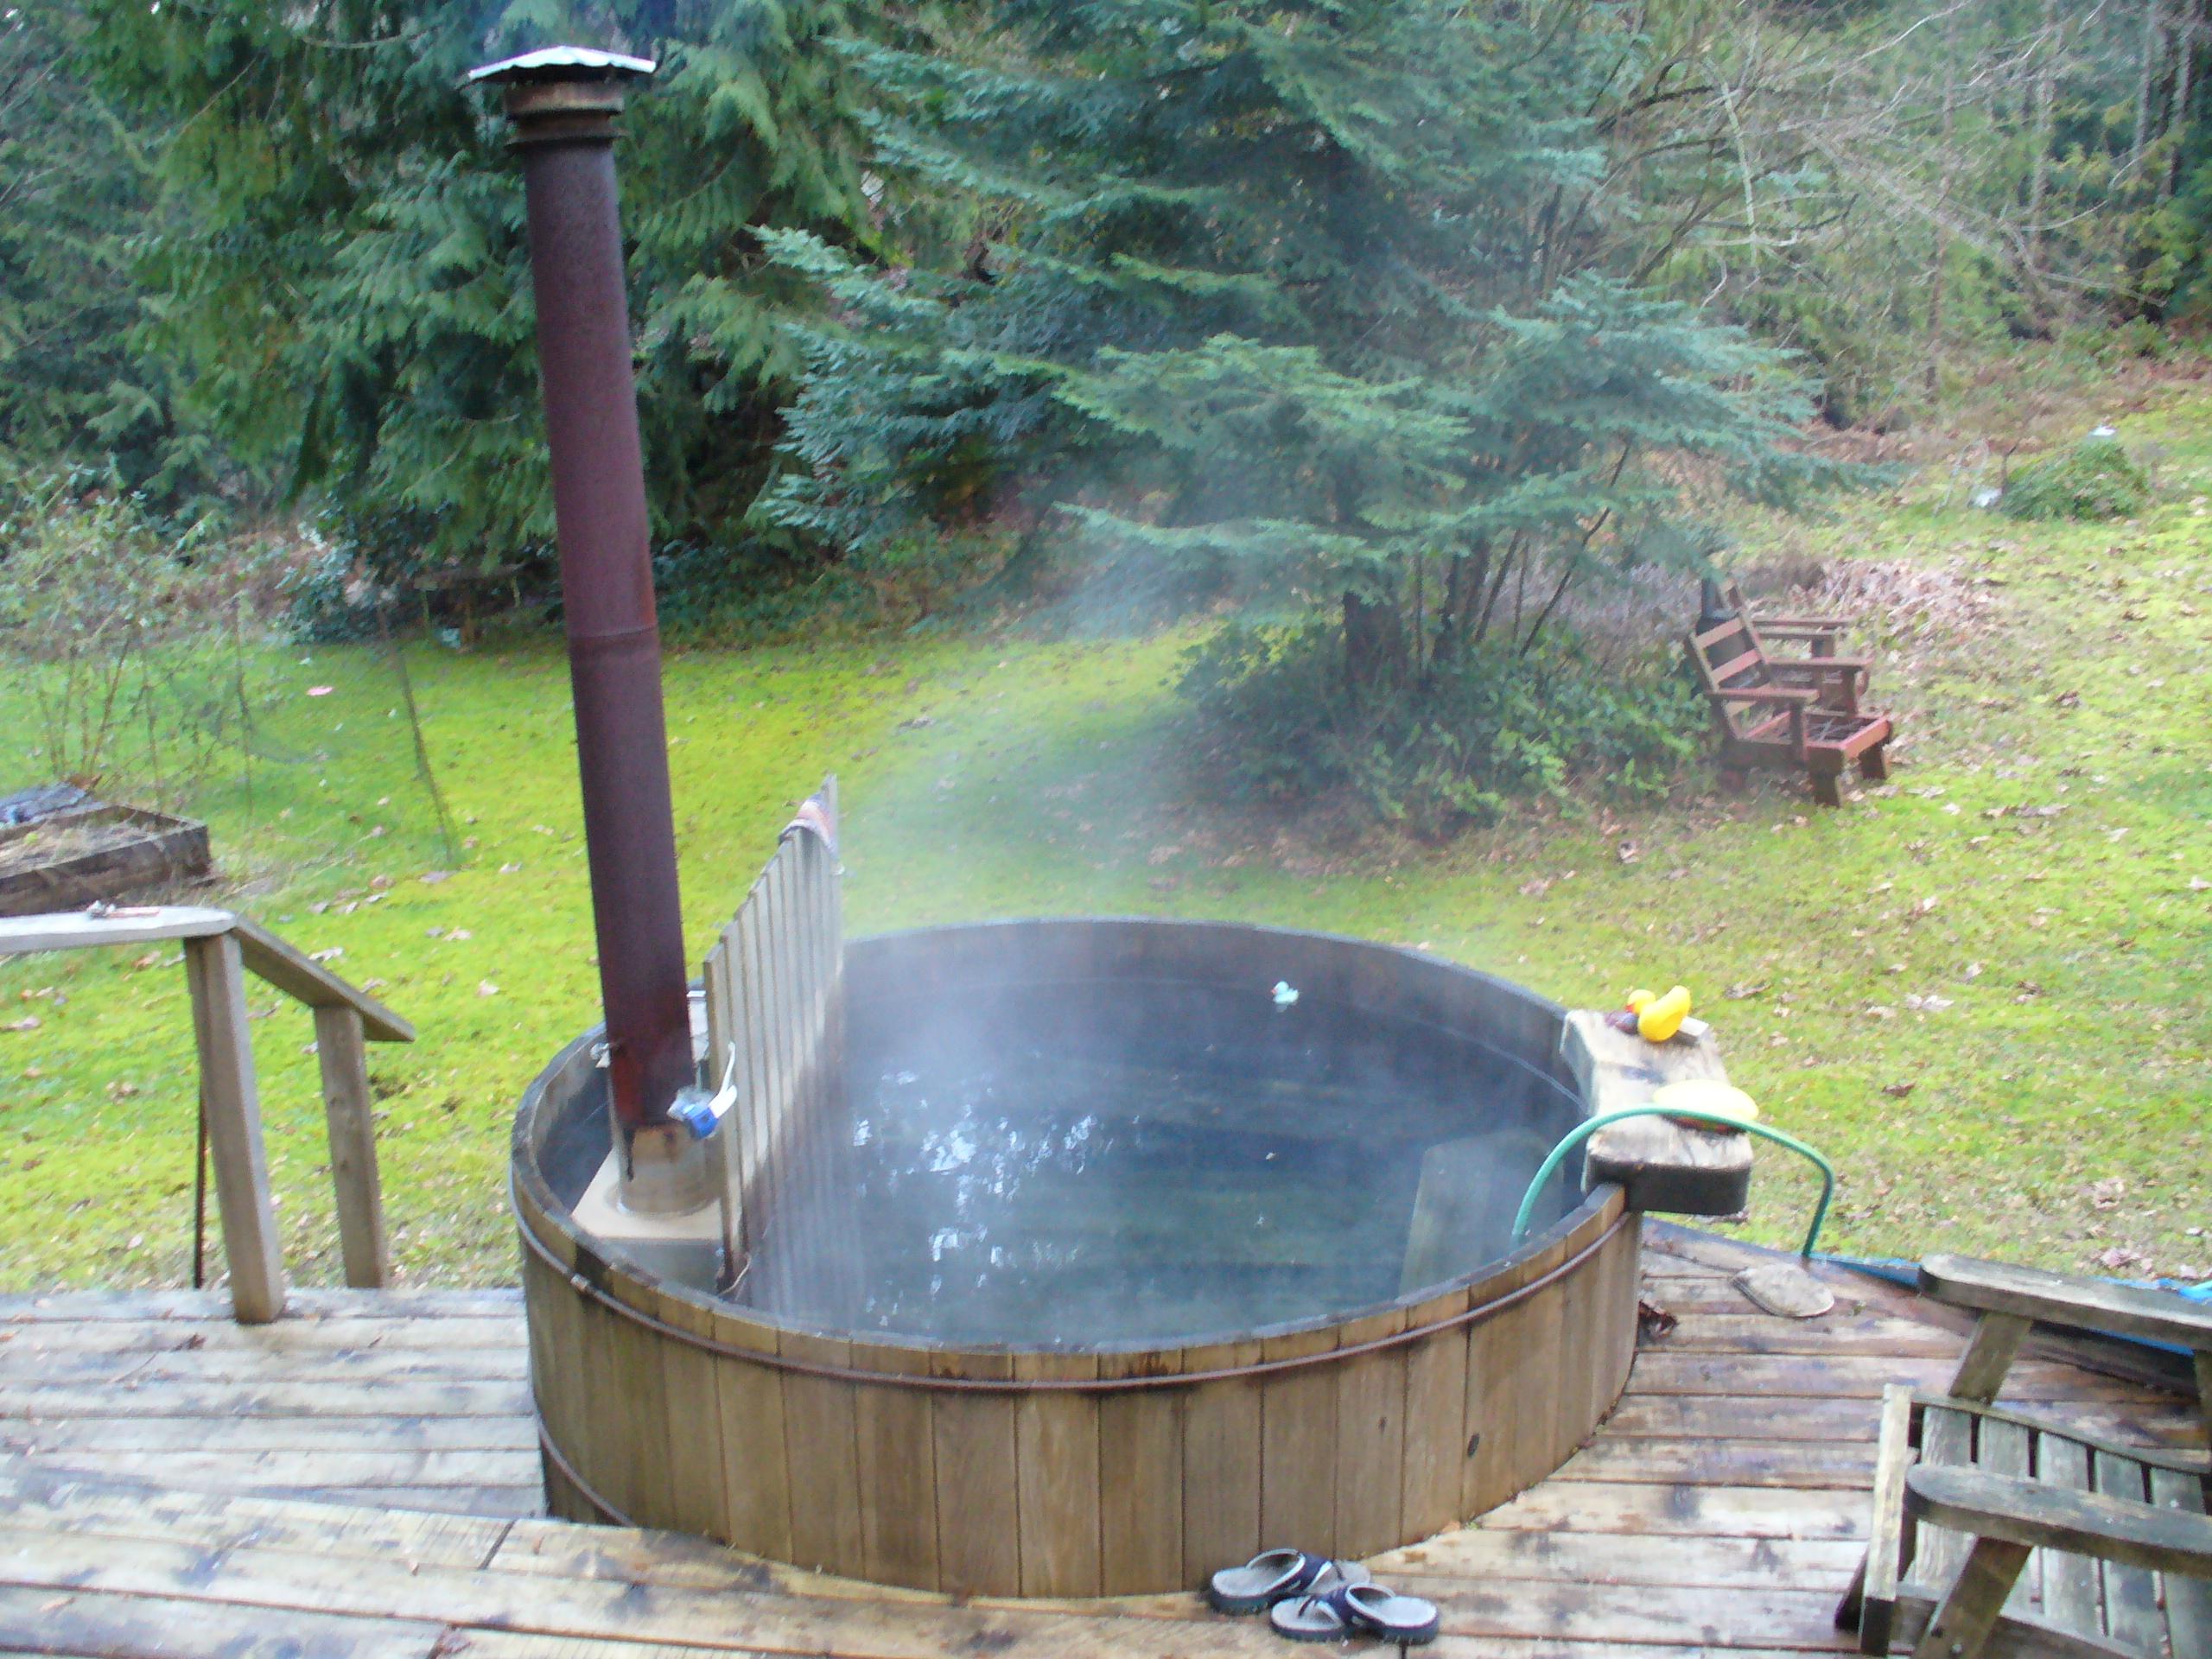 DIY How To Make Wood Burning Hot Tub Wooden PDF practical